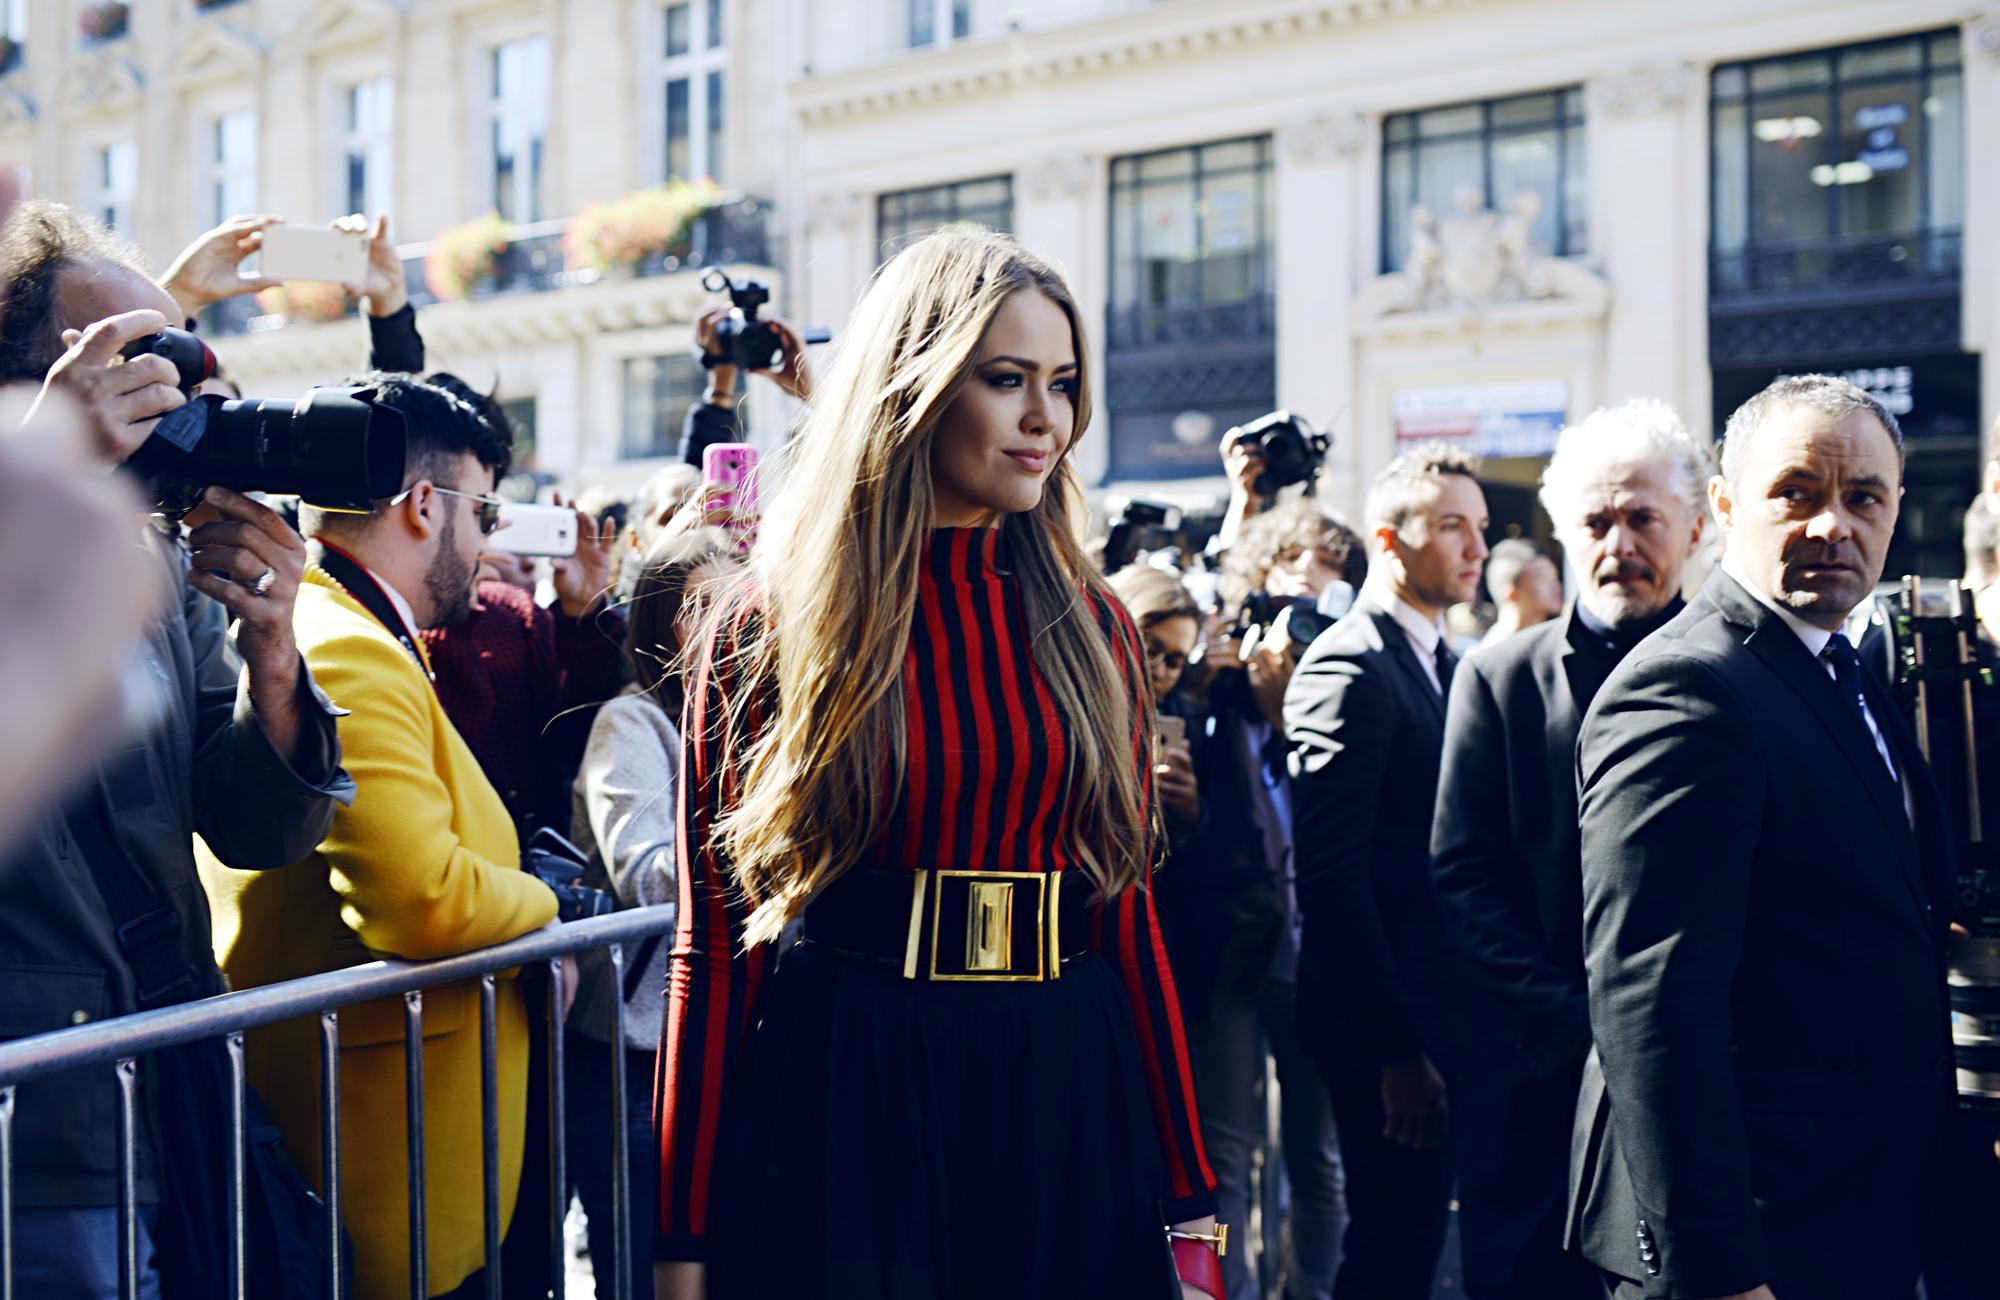 Cibelle x Kristina | L'OrealStreet_26